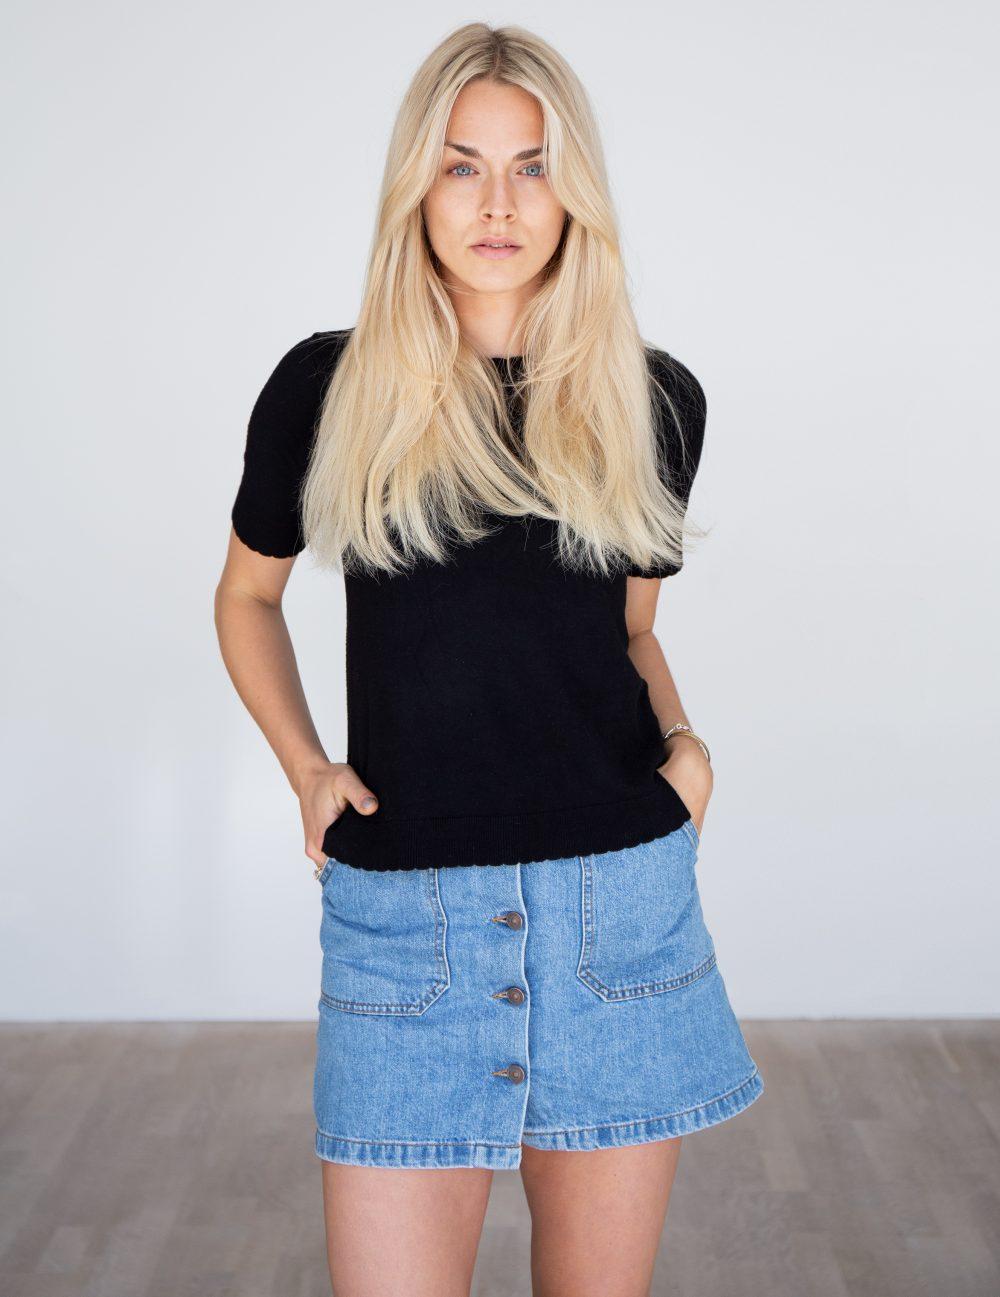 Images Johanna Thuresson nude (98 photos), Topless, Sideboobs, Boobs, bra 2019